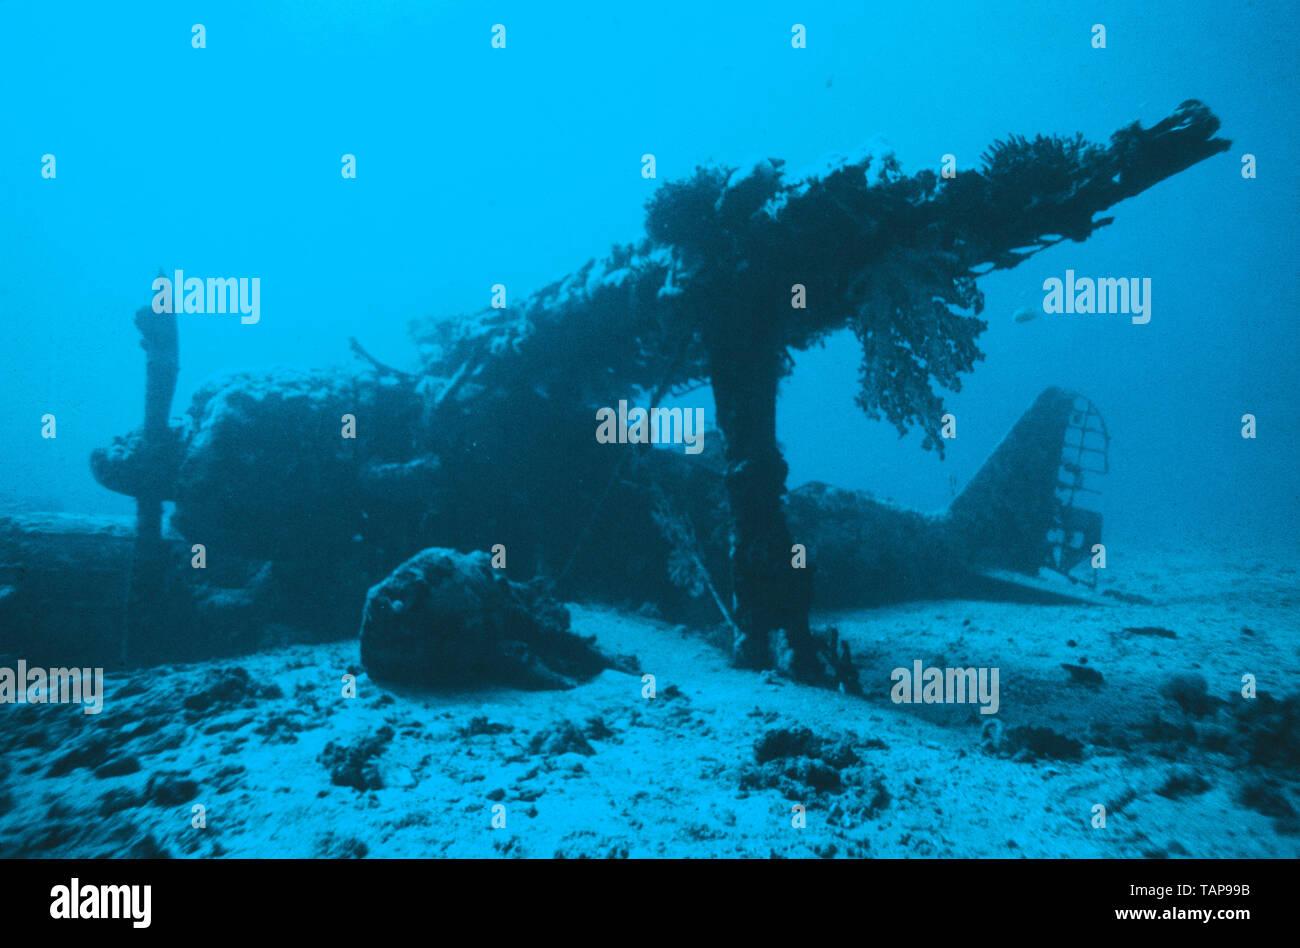 Papua New Guinea. Rabaul.  Underwater view of World War 2 Japanese Mitsubishi F1M floatplane wreckage 'Pete'. - Stock Image